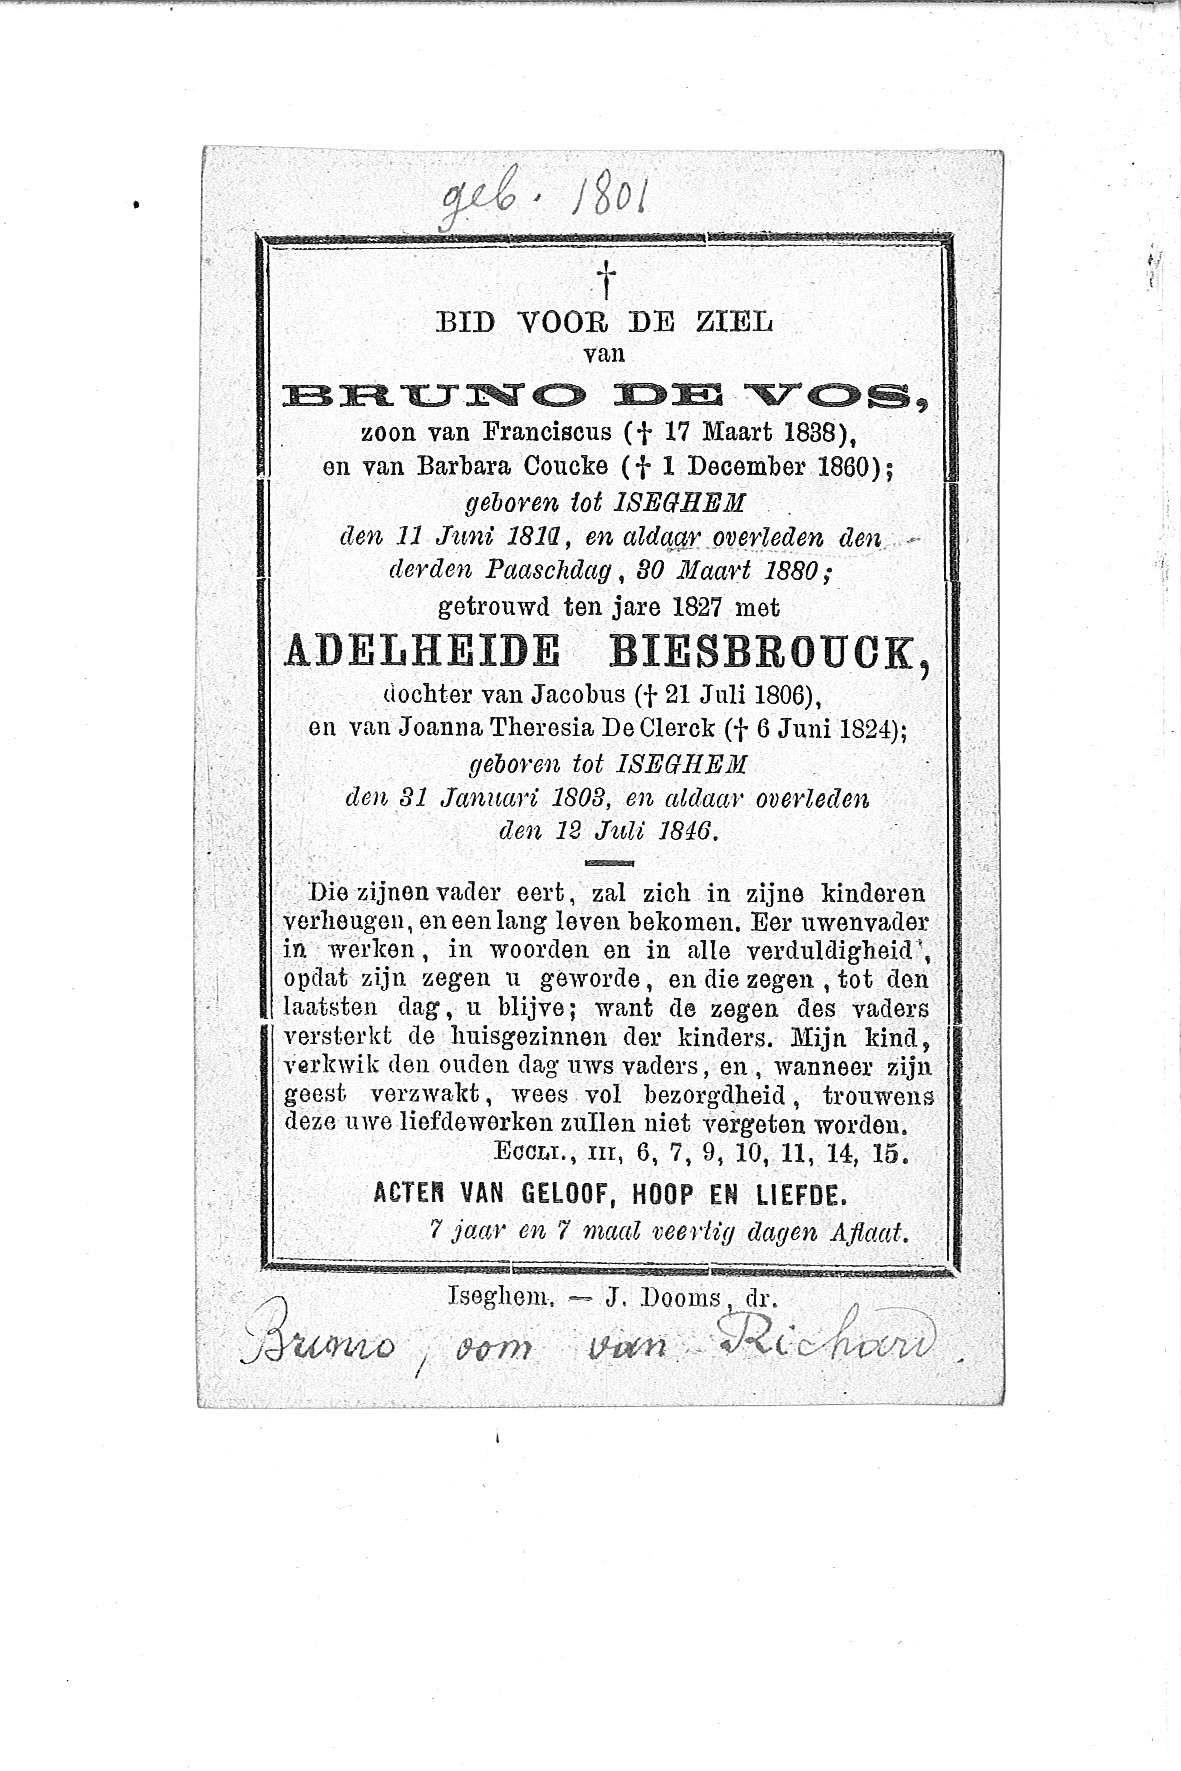 Bruno (1880) 20120228155553_00021.jpg